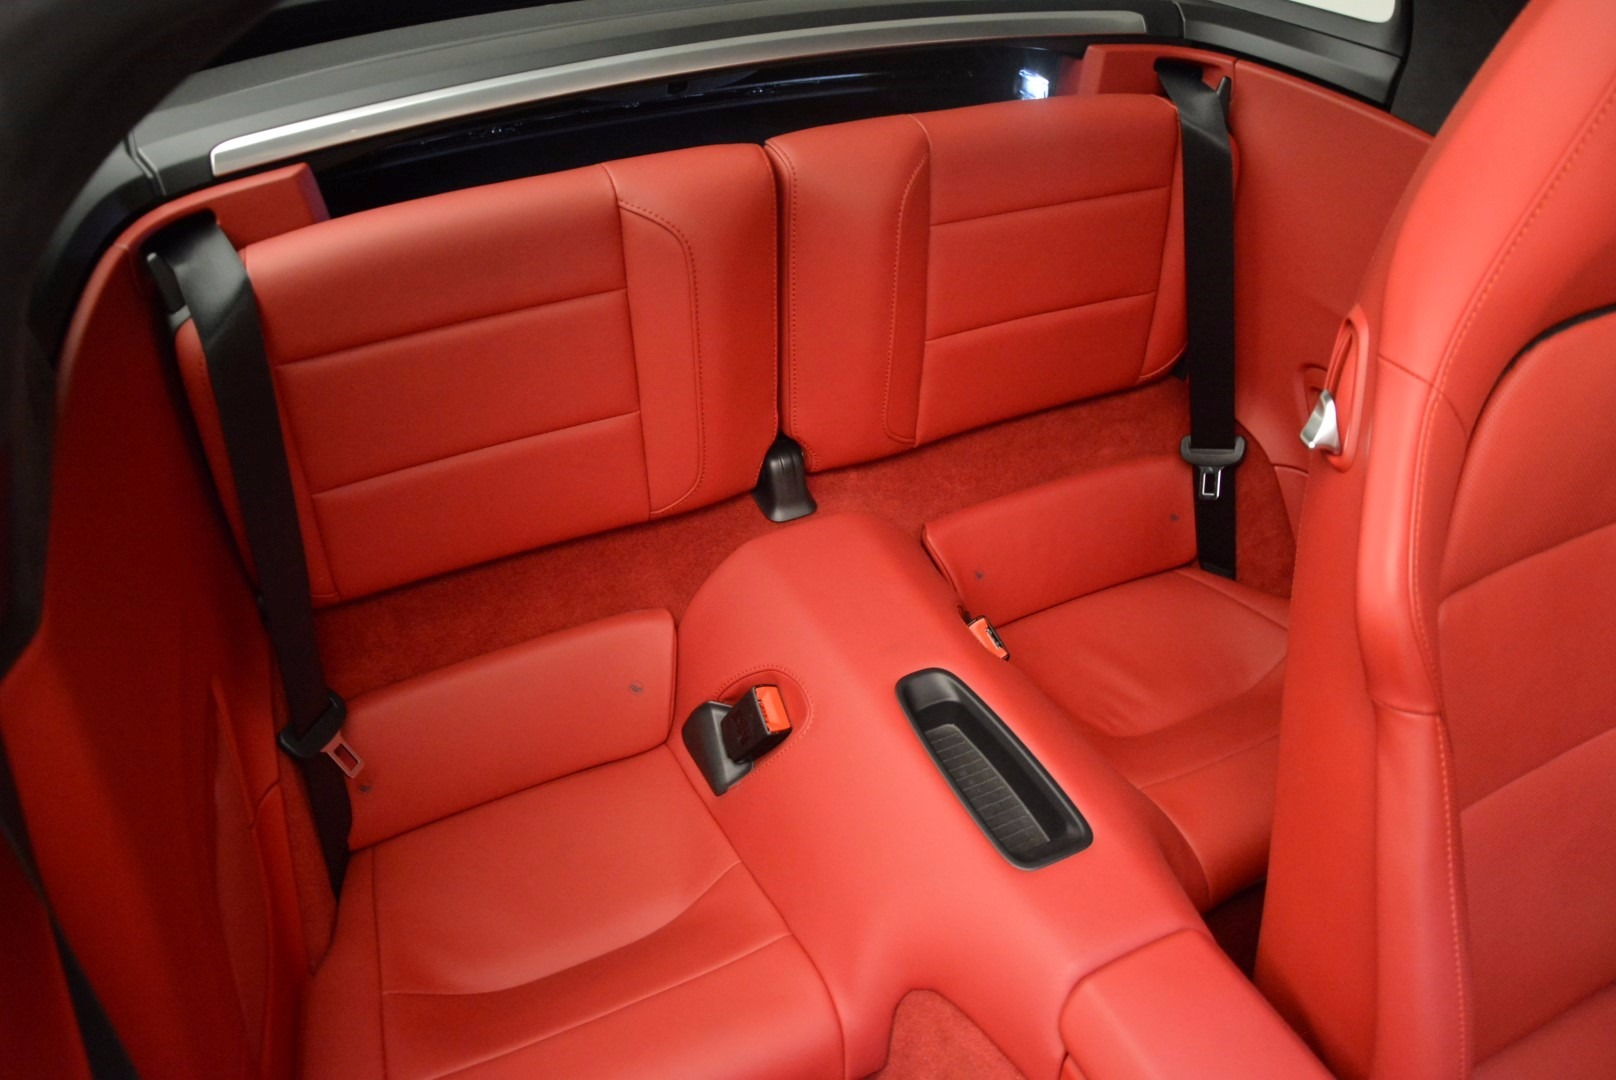 Used 2015 Porsche 911 Targa 4S For Sale In Greenwich, CT 1476_p28